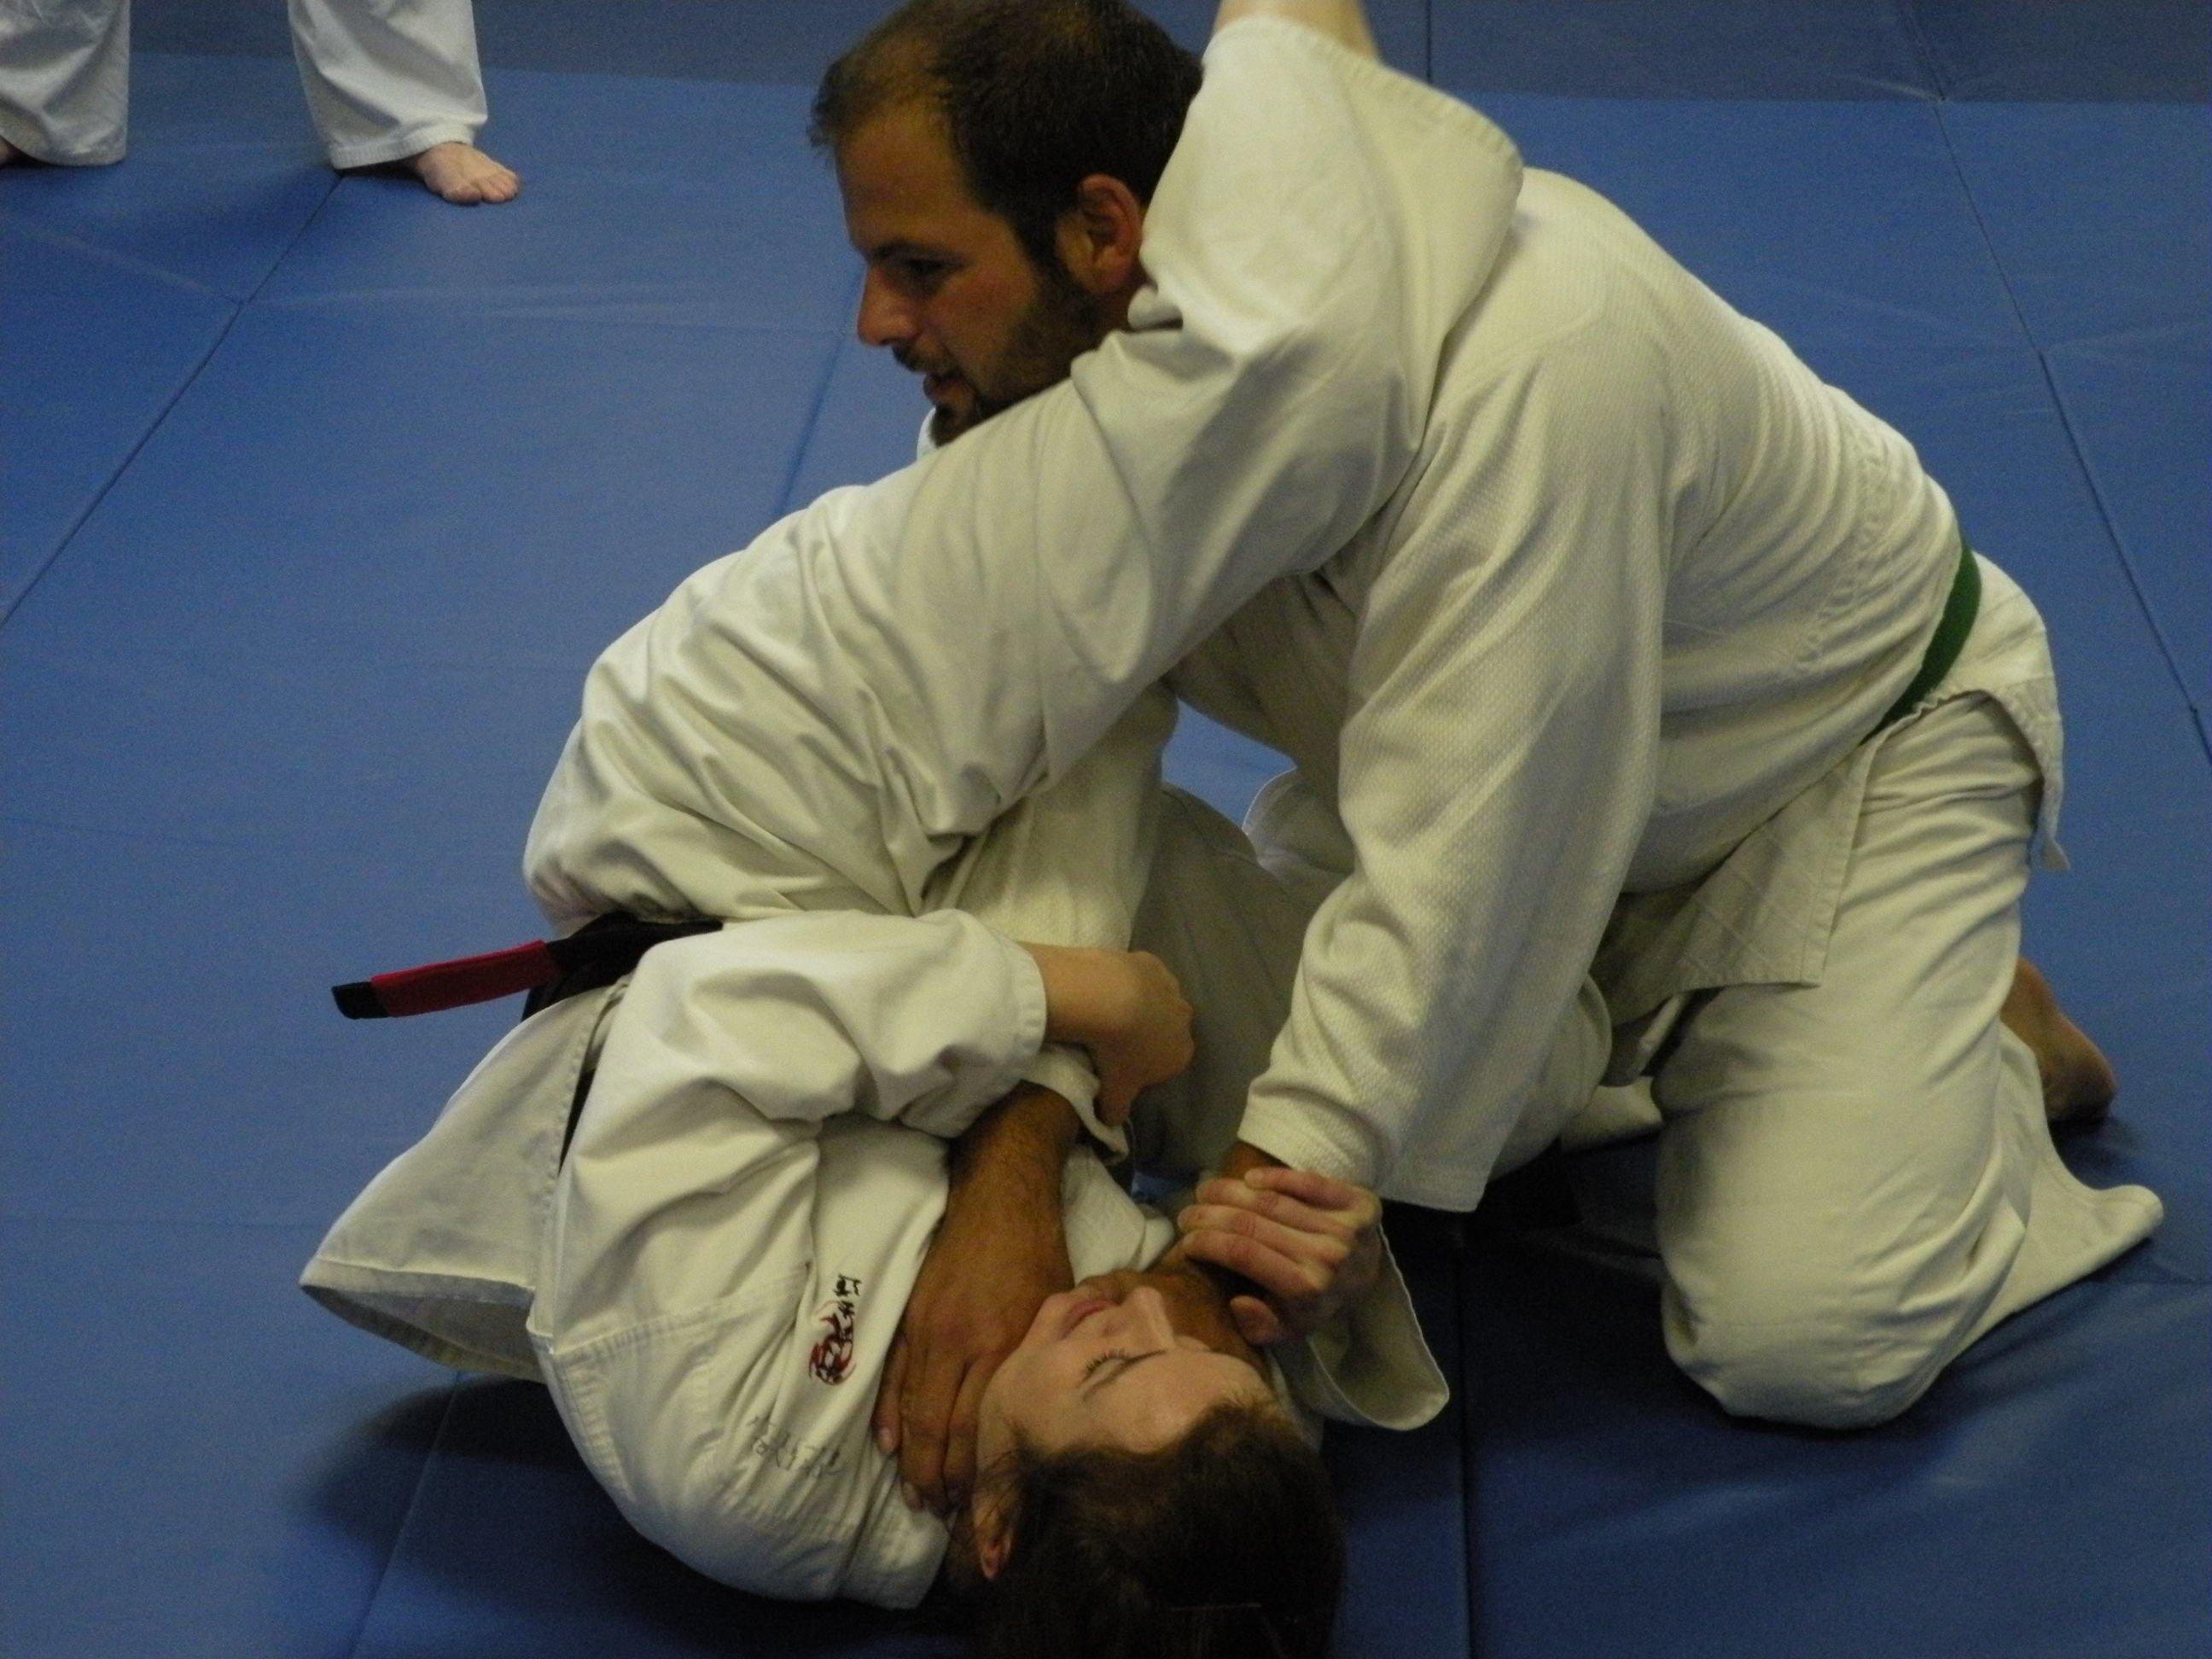 About Ju Jitsu in Rugby